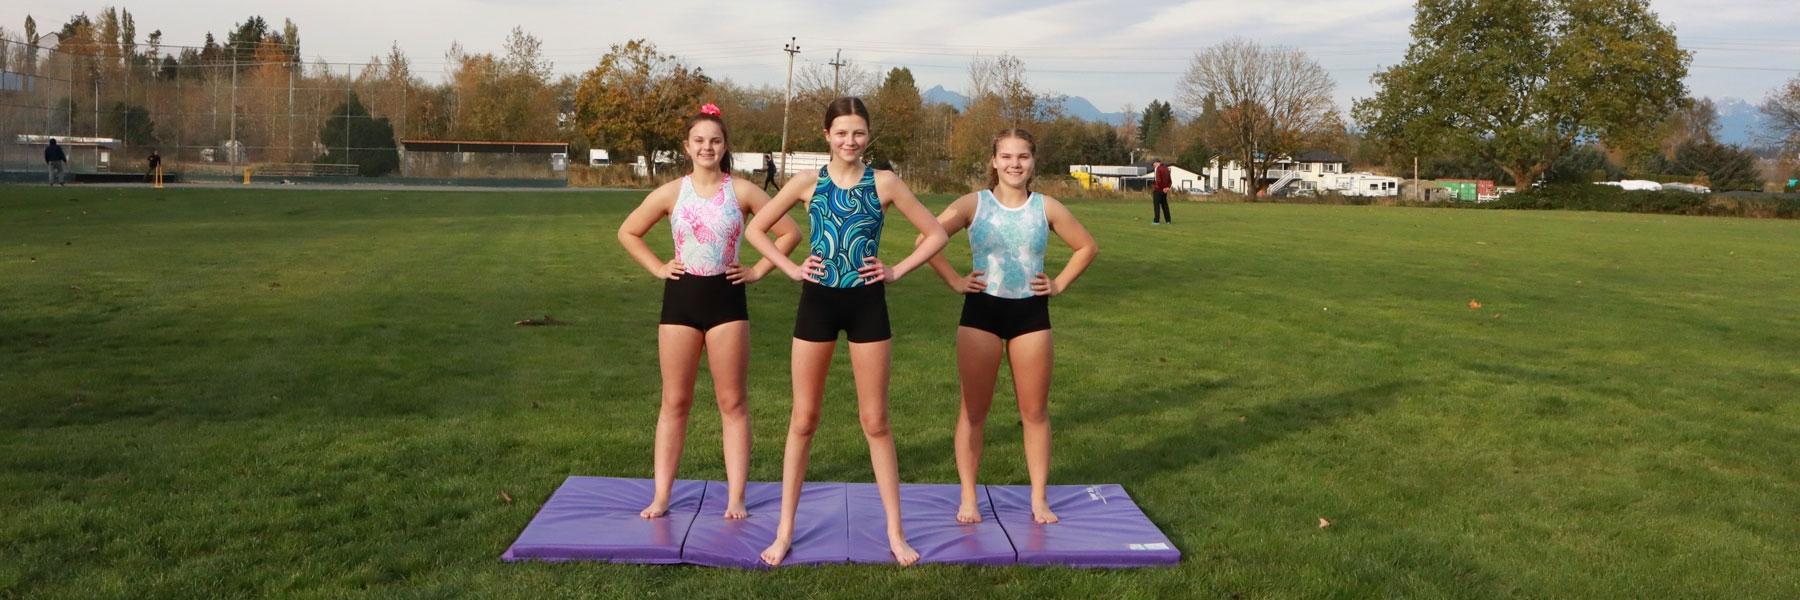 3gymnasticsleotards2